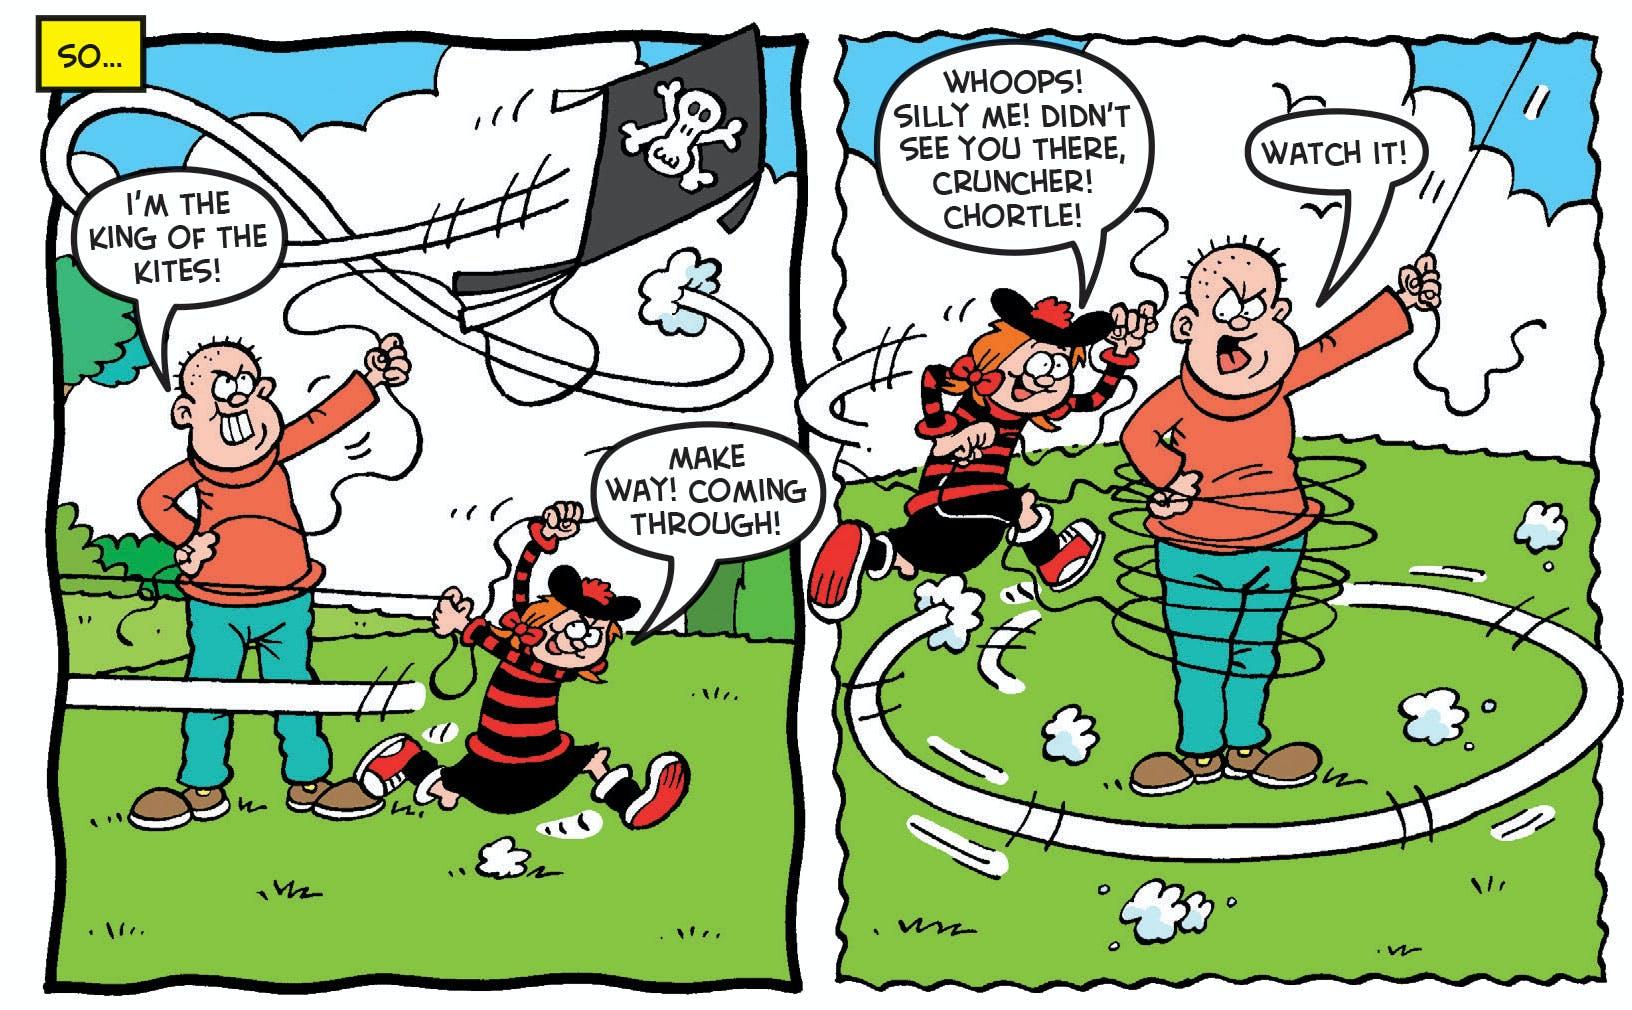 minnie the minx kite